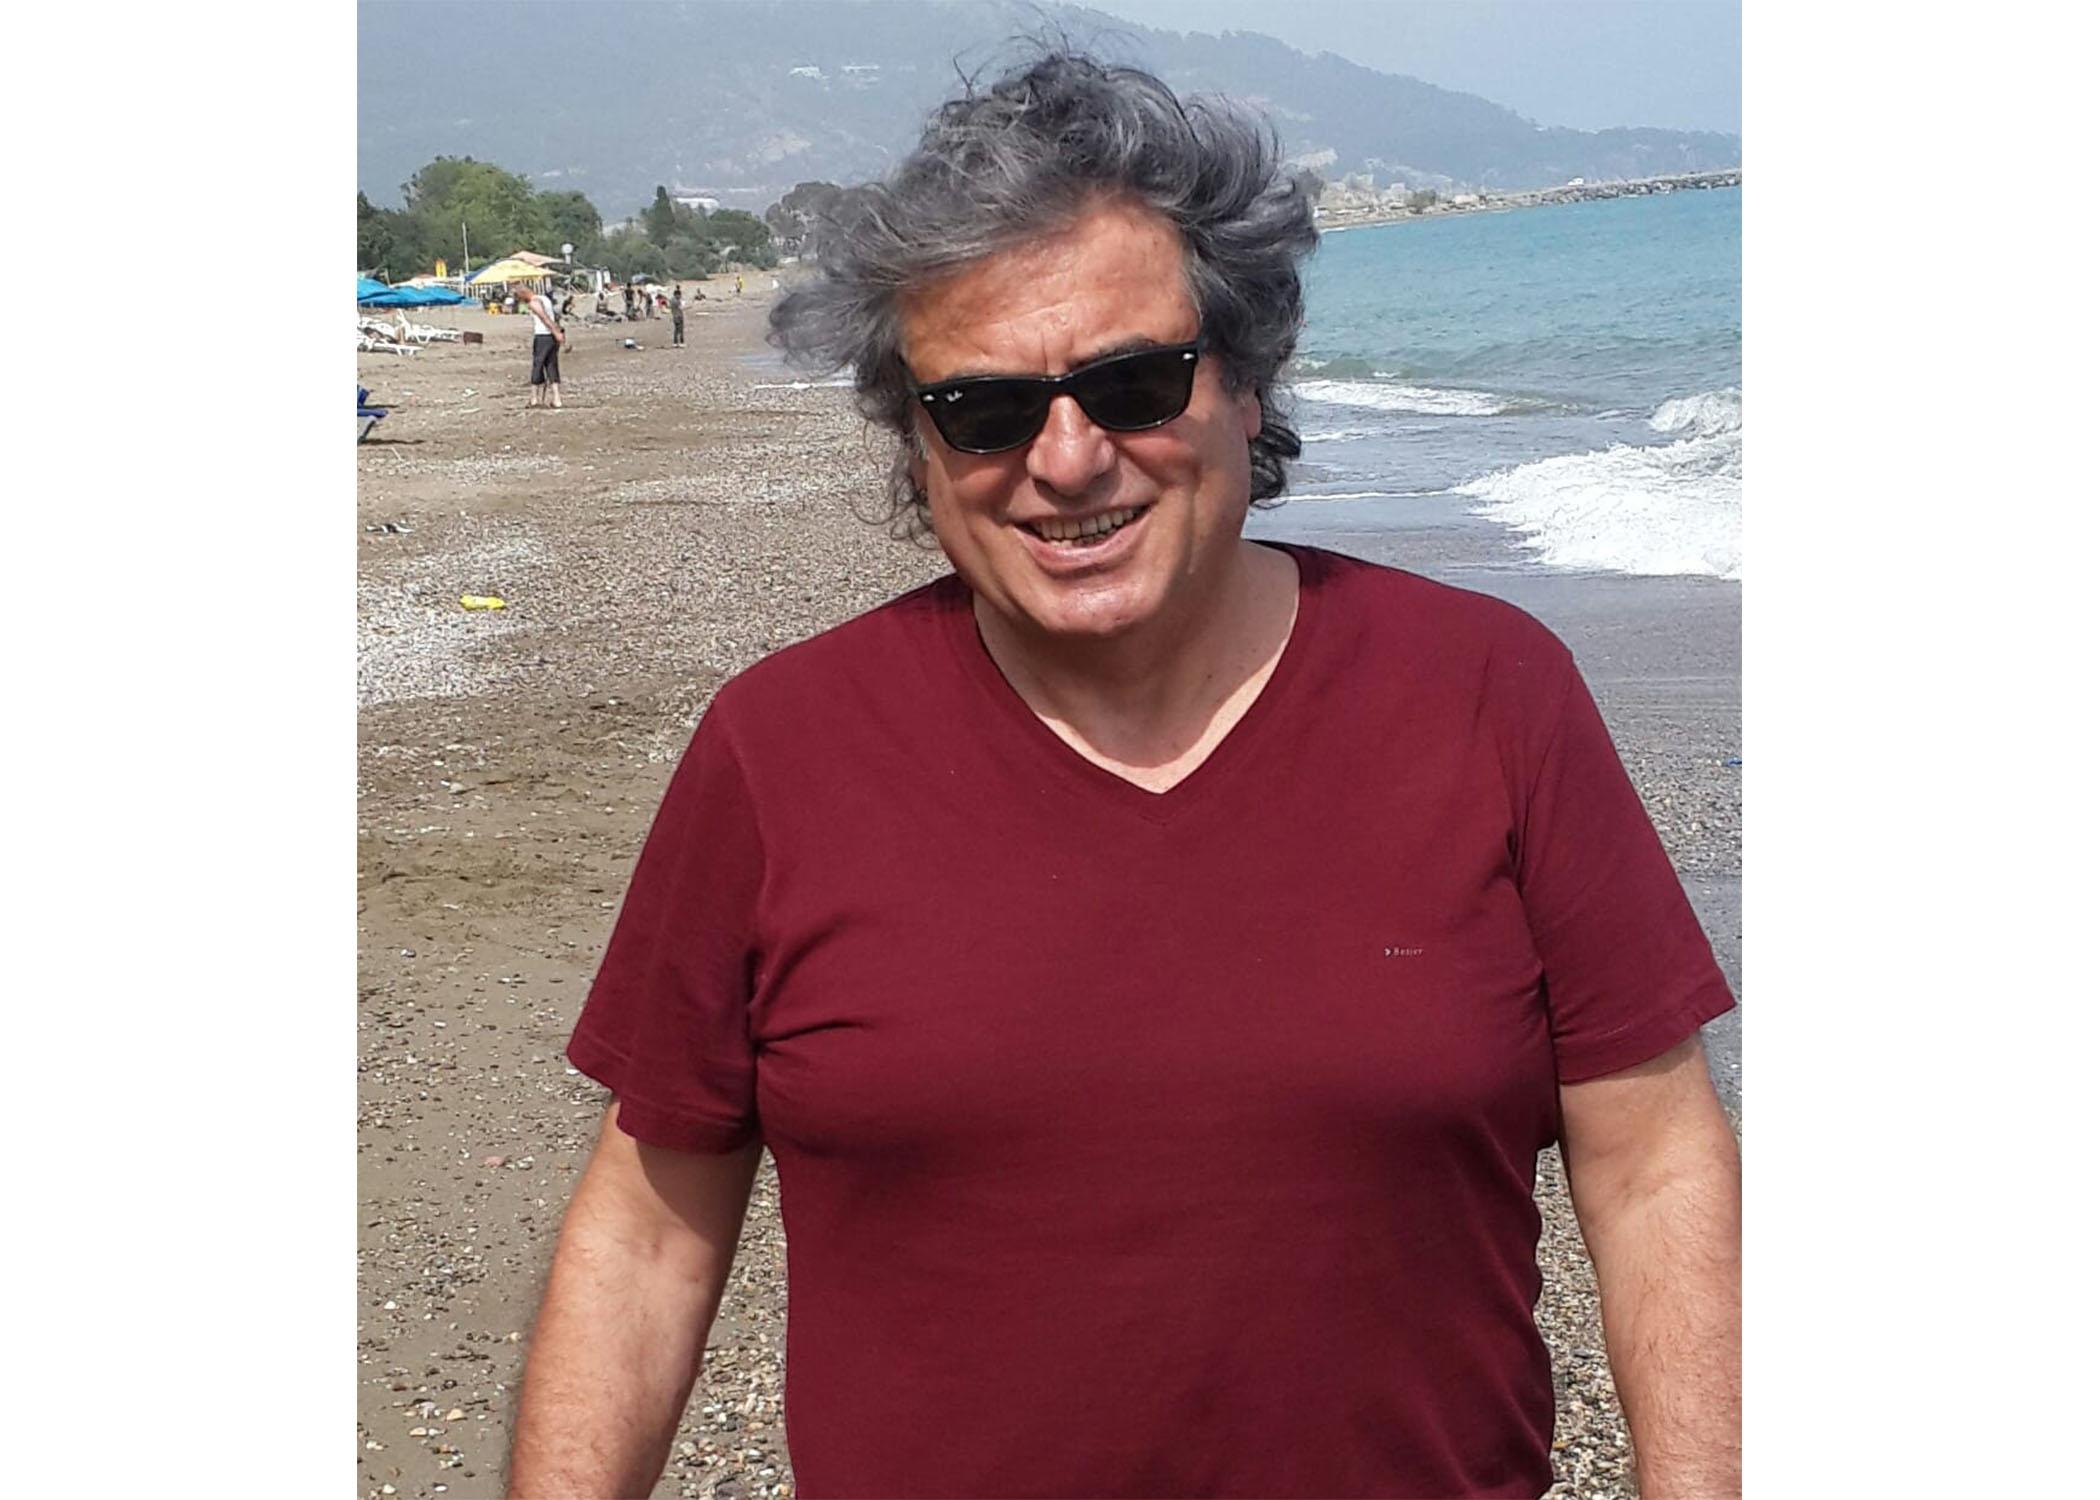 ANAMUR'LU İŞ İNSAN HAYATA VEDA ETTİ.